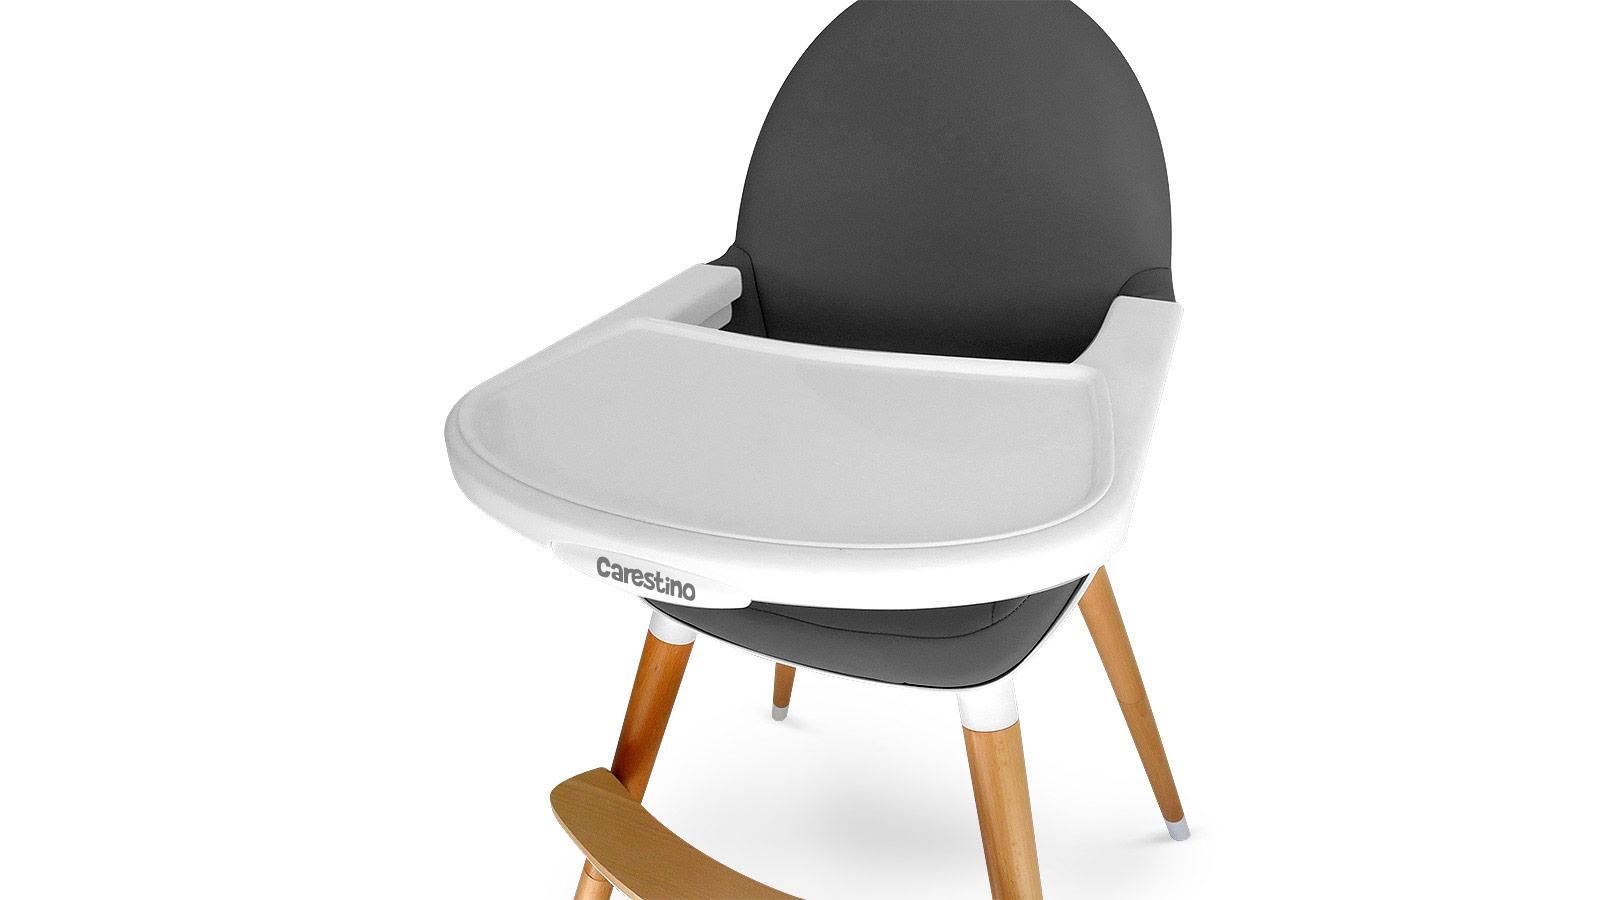 Carestino productos sillas de comer sillas de comer for Sillas en gris